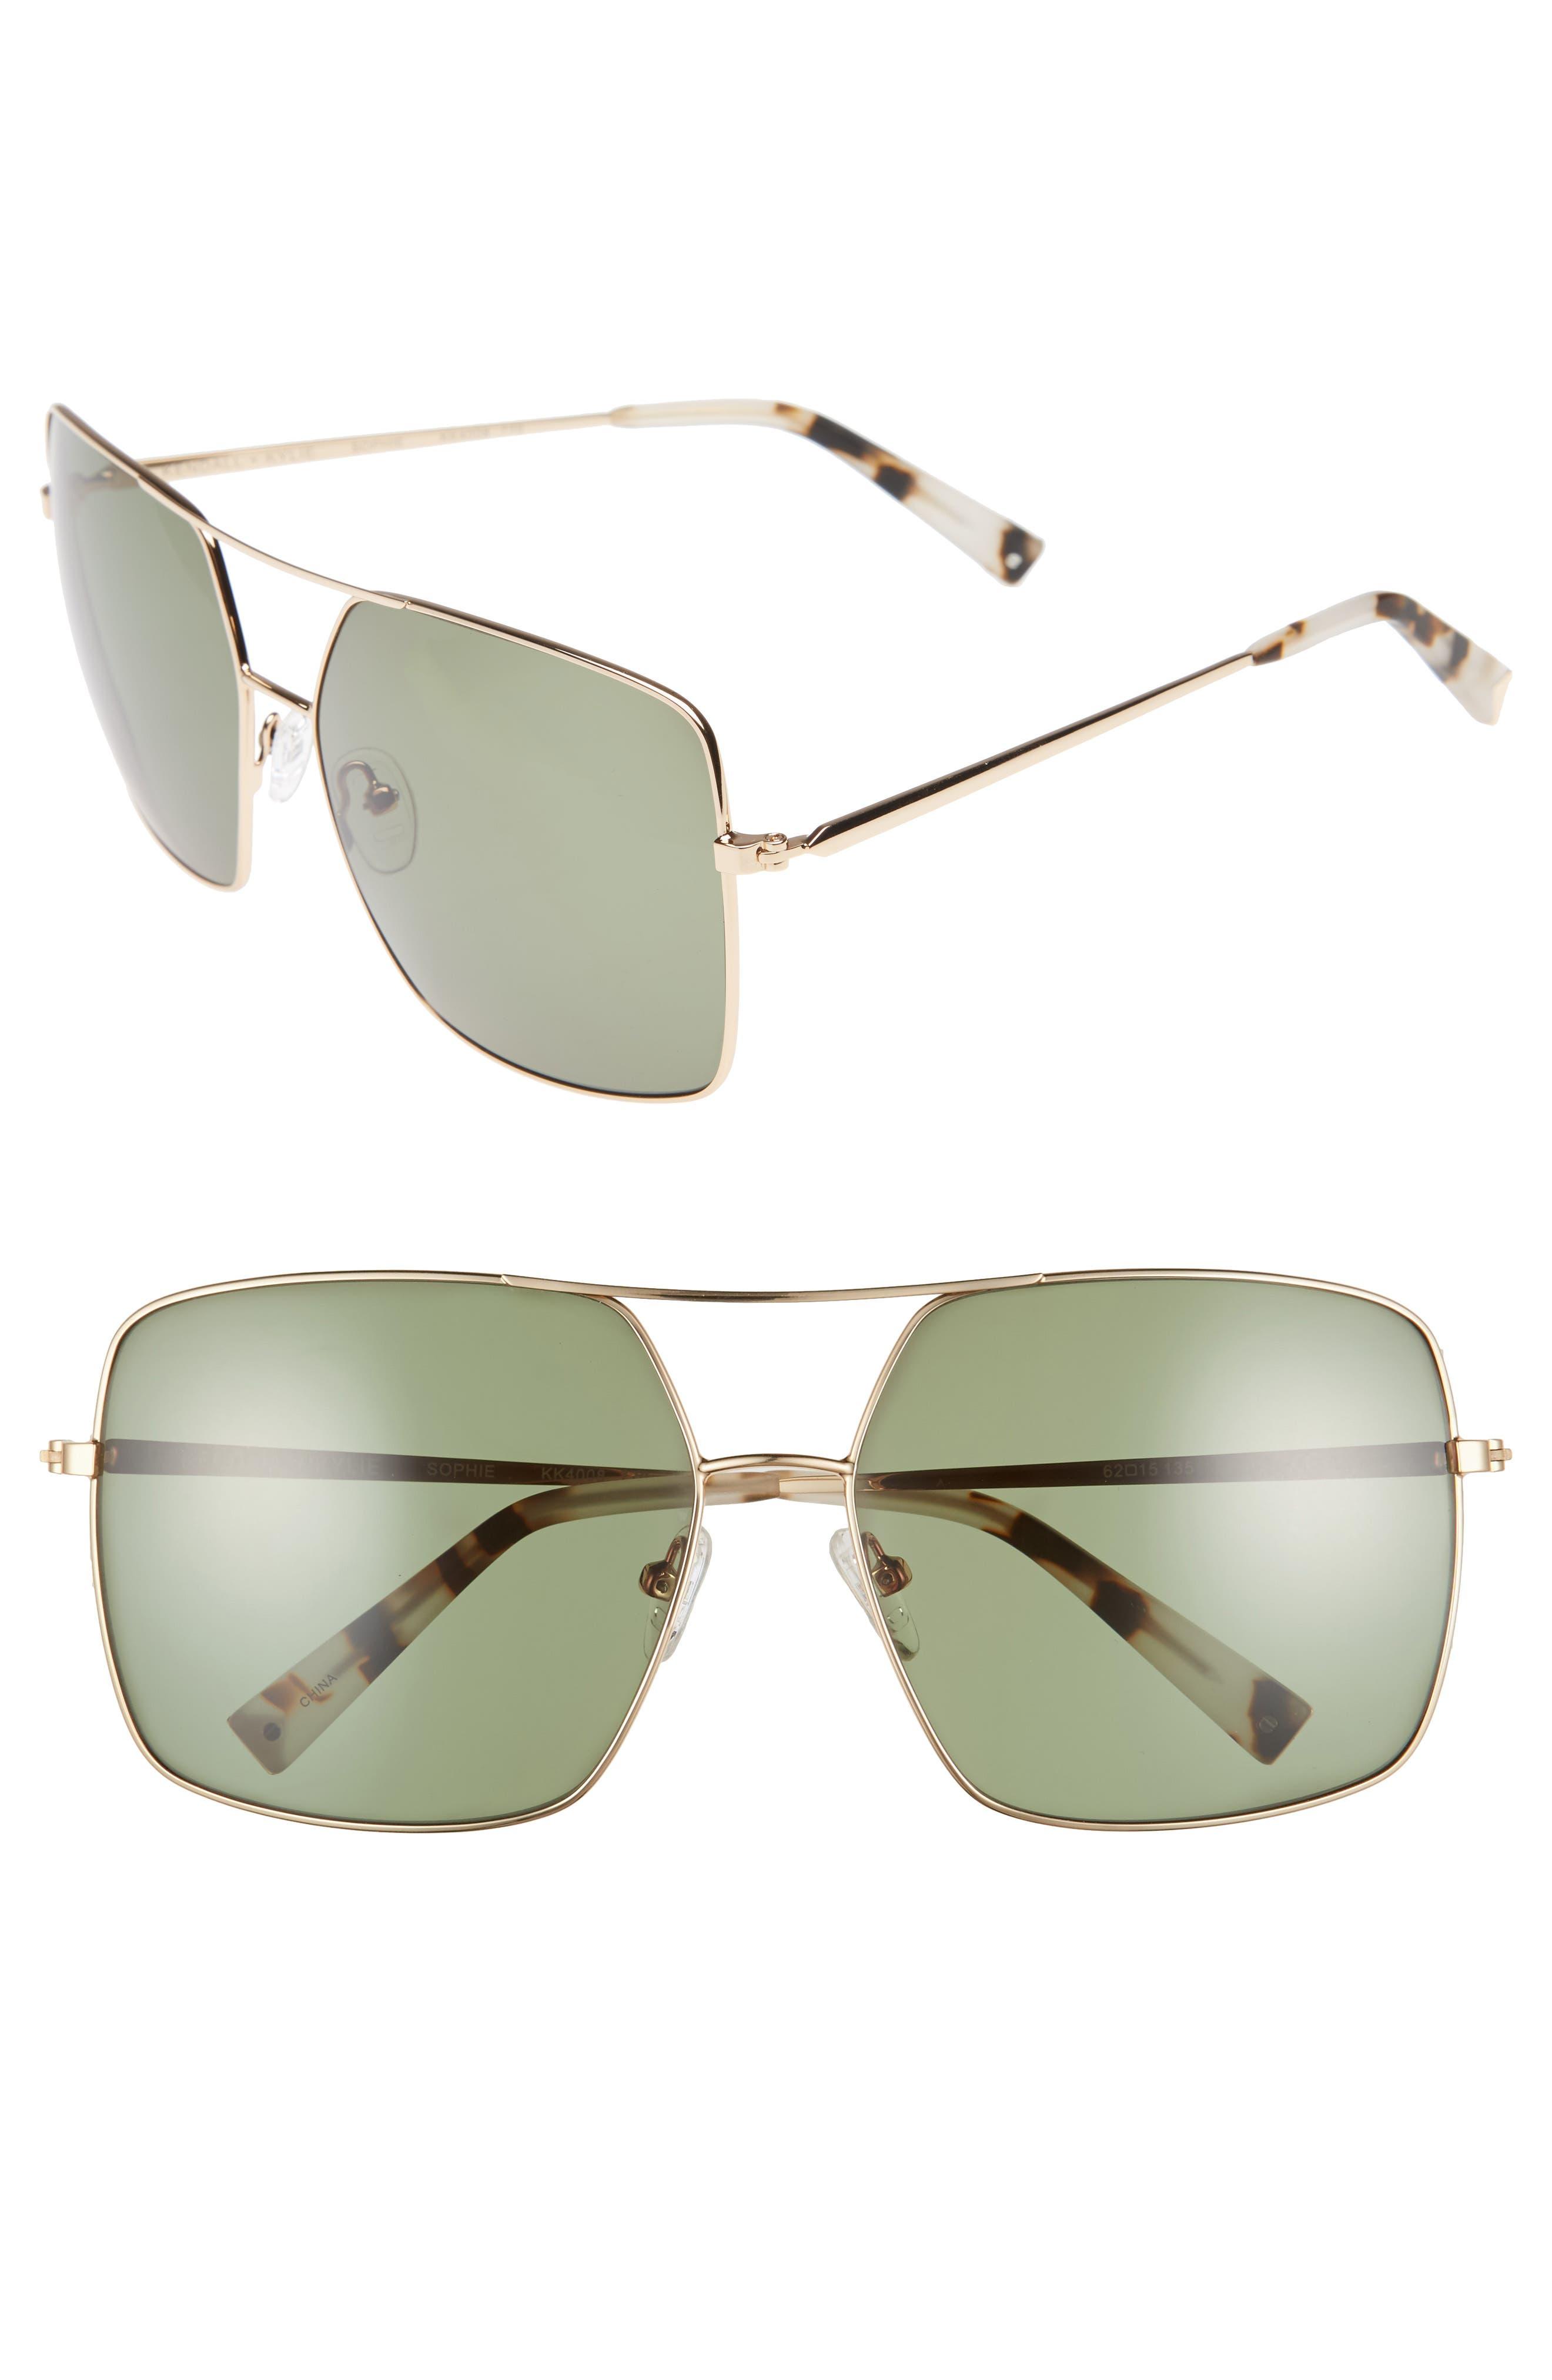 Main Image - KENDALL + KYLIE 65mm Navigator Sunglasses